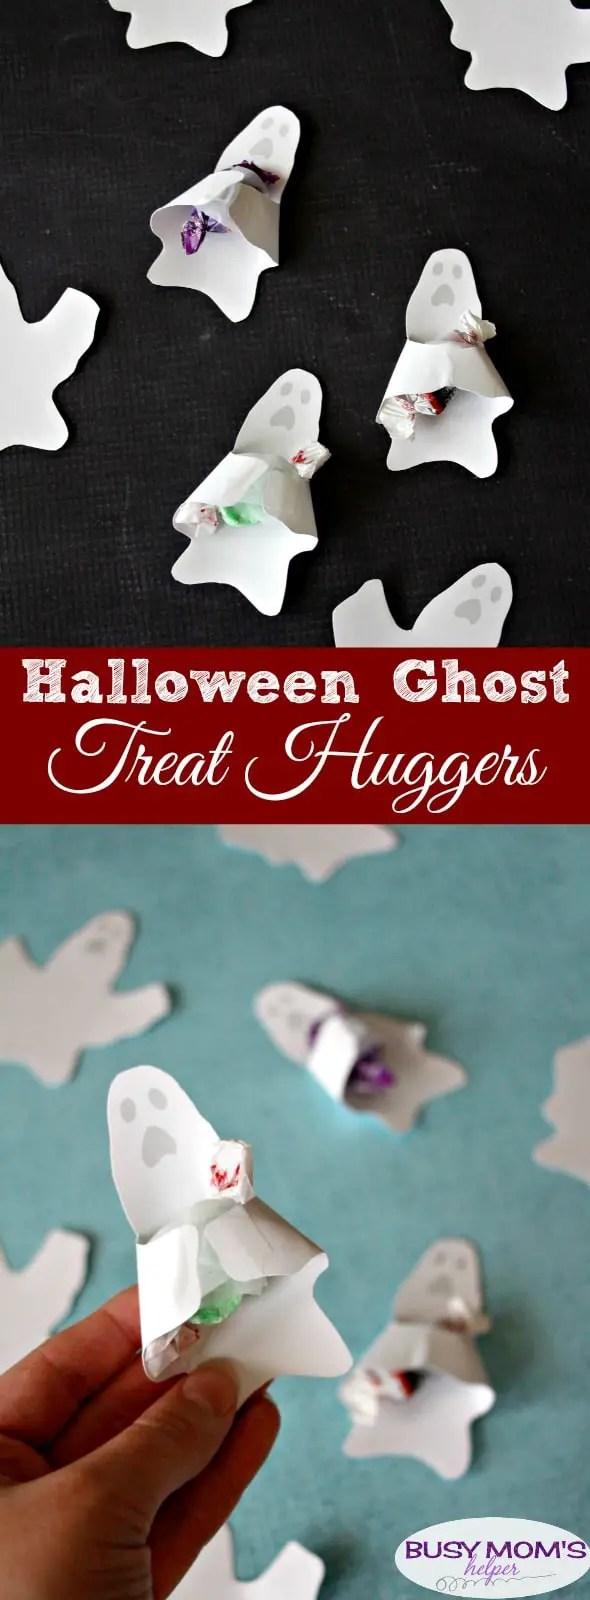 Halloween Ghost Treat Huggers free printable